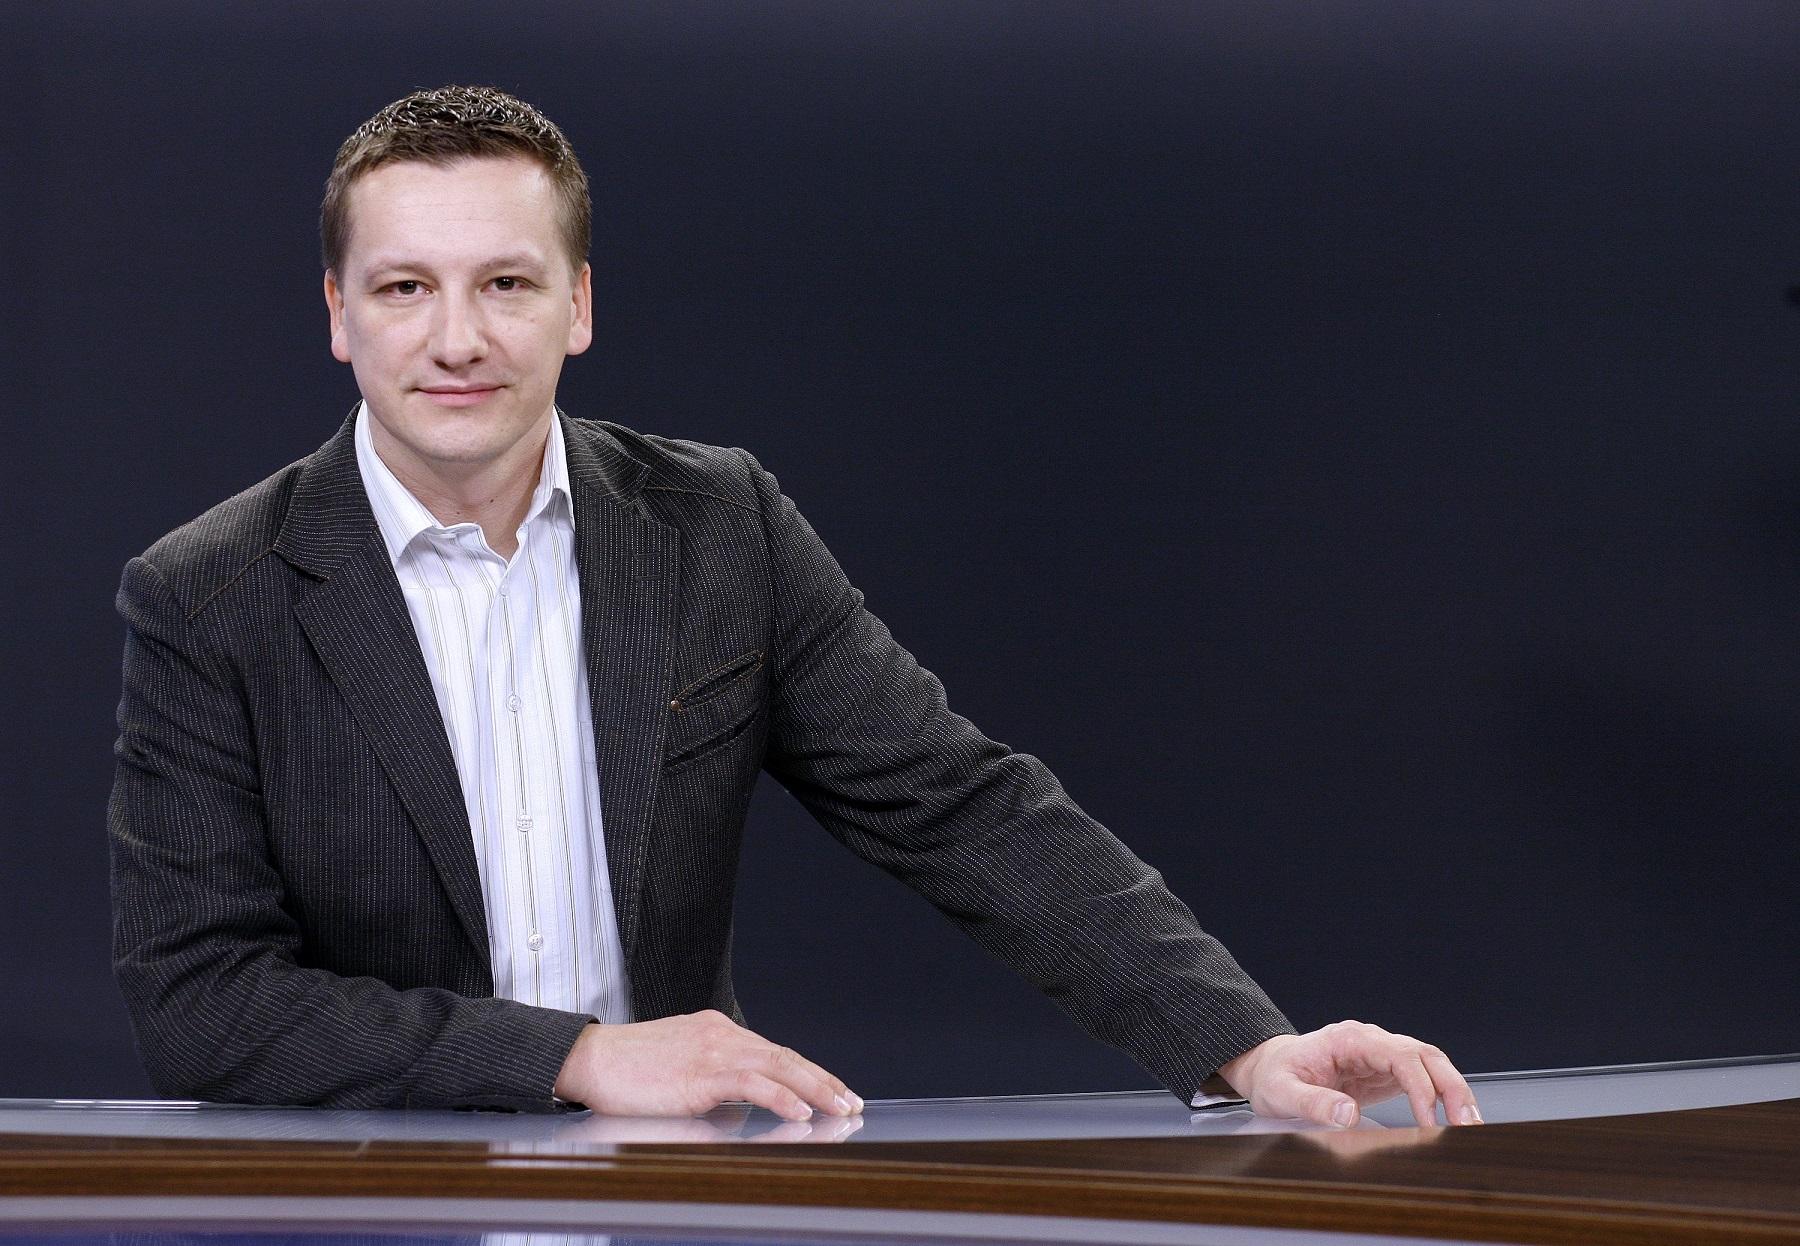 Zagreb, 140214. RTL televizija. Na fotografiji: Tomislav Jelincic, urednik i voditelj na RTL televiziji. Foto: Biljana Gaurina / CROPIX